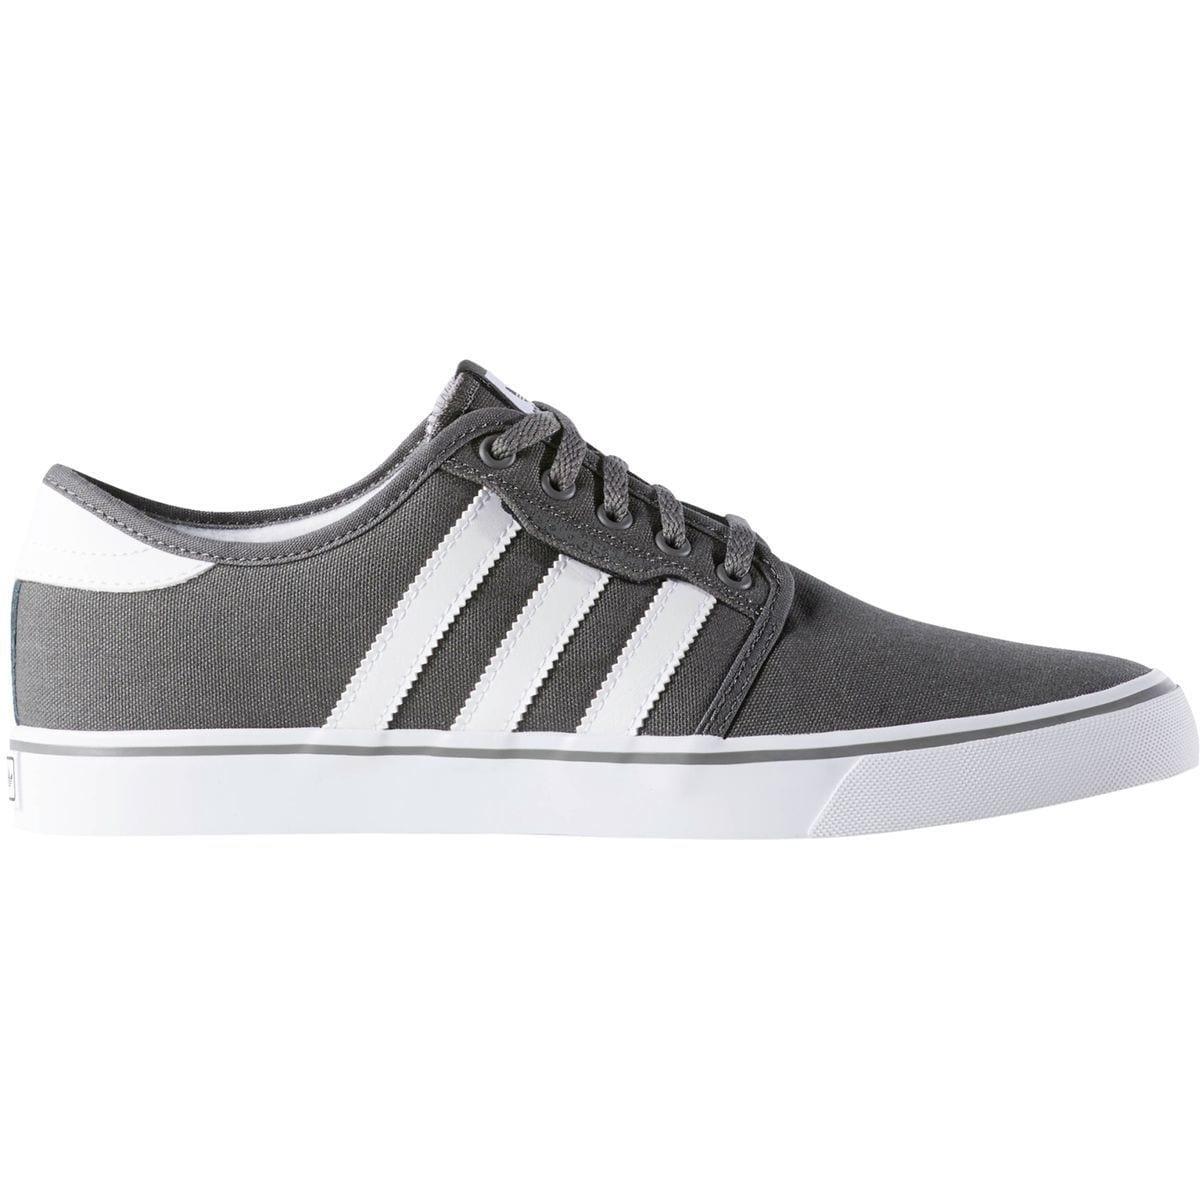 Adidas Seeley Skate Shoe - Men's